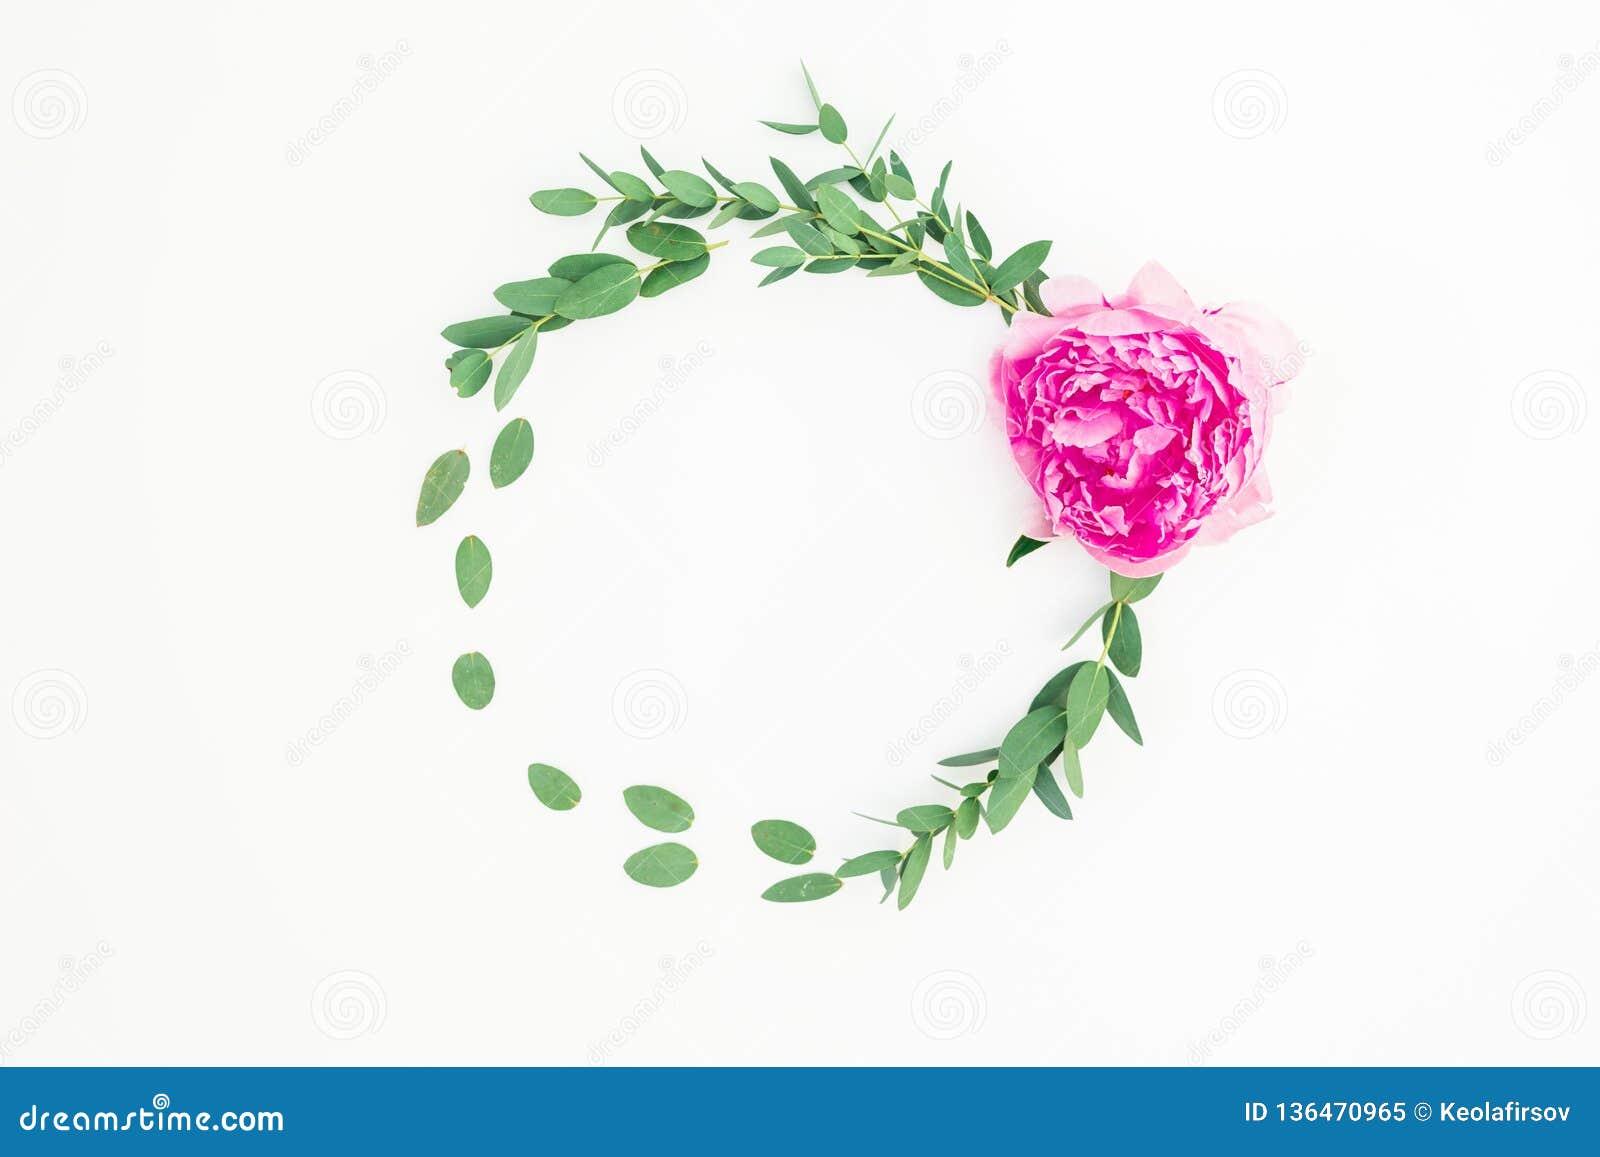 Floral στρογγυλό πλαίσιο με το ρόδινους peony λουλούδι, το hypericum και τον ευκάλυπτο στο άσπρο υπόβαθρο Επίπεδος βάλτε, τοπ άπο